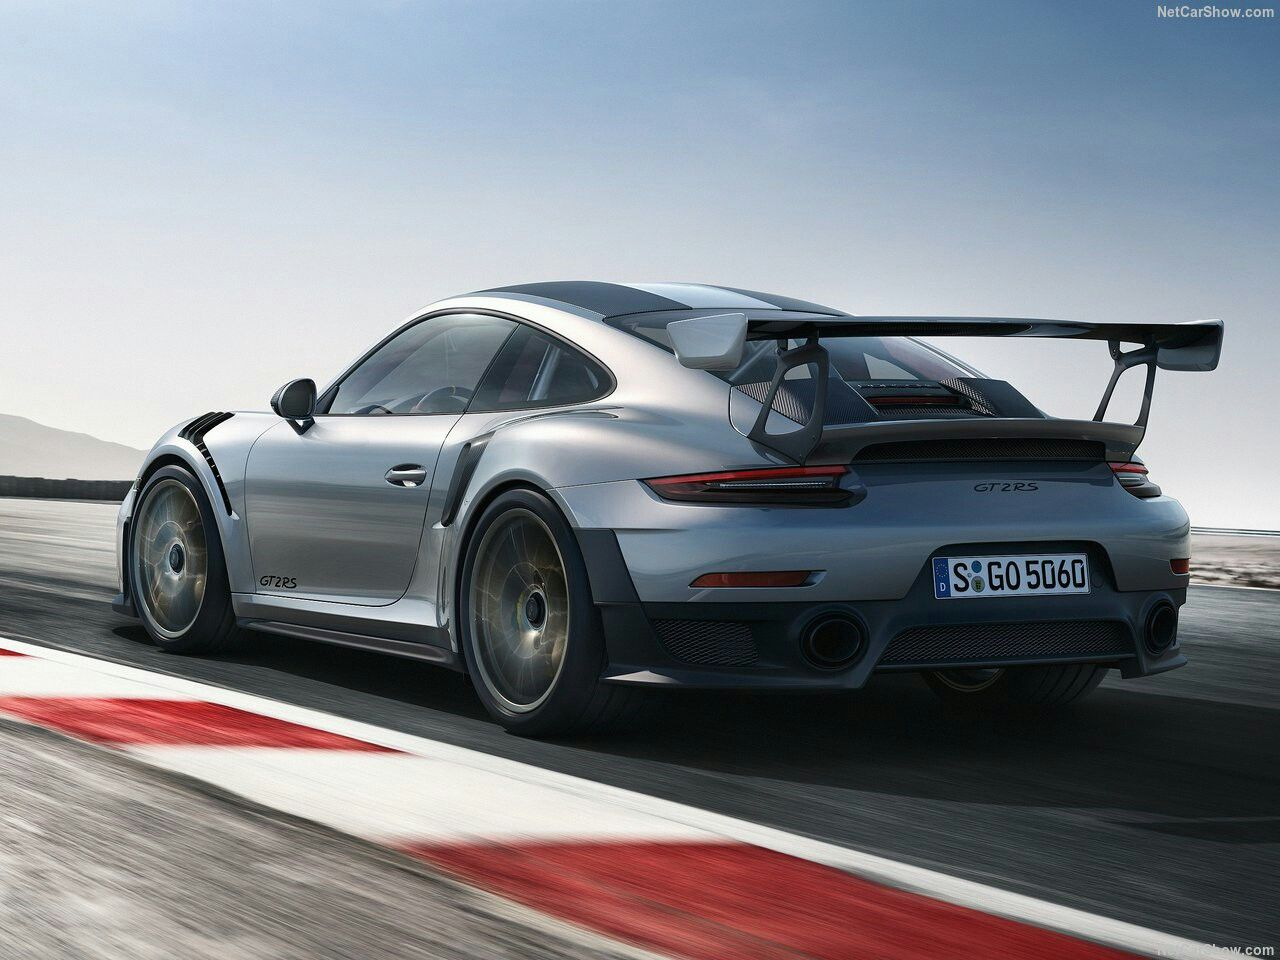 Porsche Gt2 Rs 2018 Porsche 911 Gt2 Rs Porsche 911 Gt2 Audi Motorsport